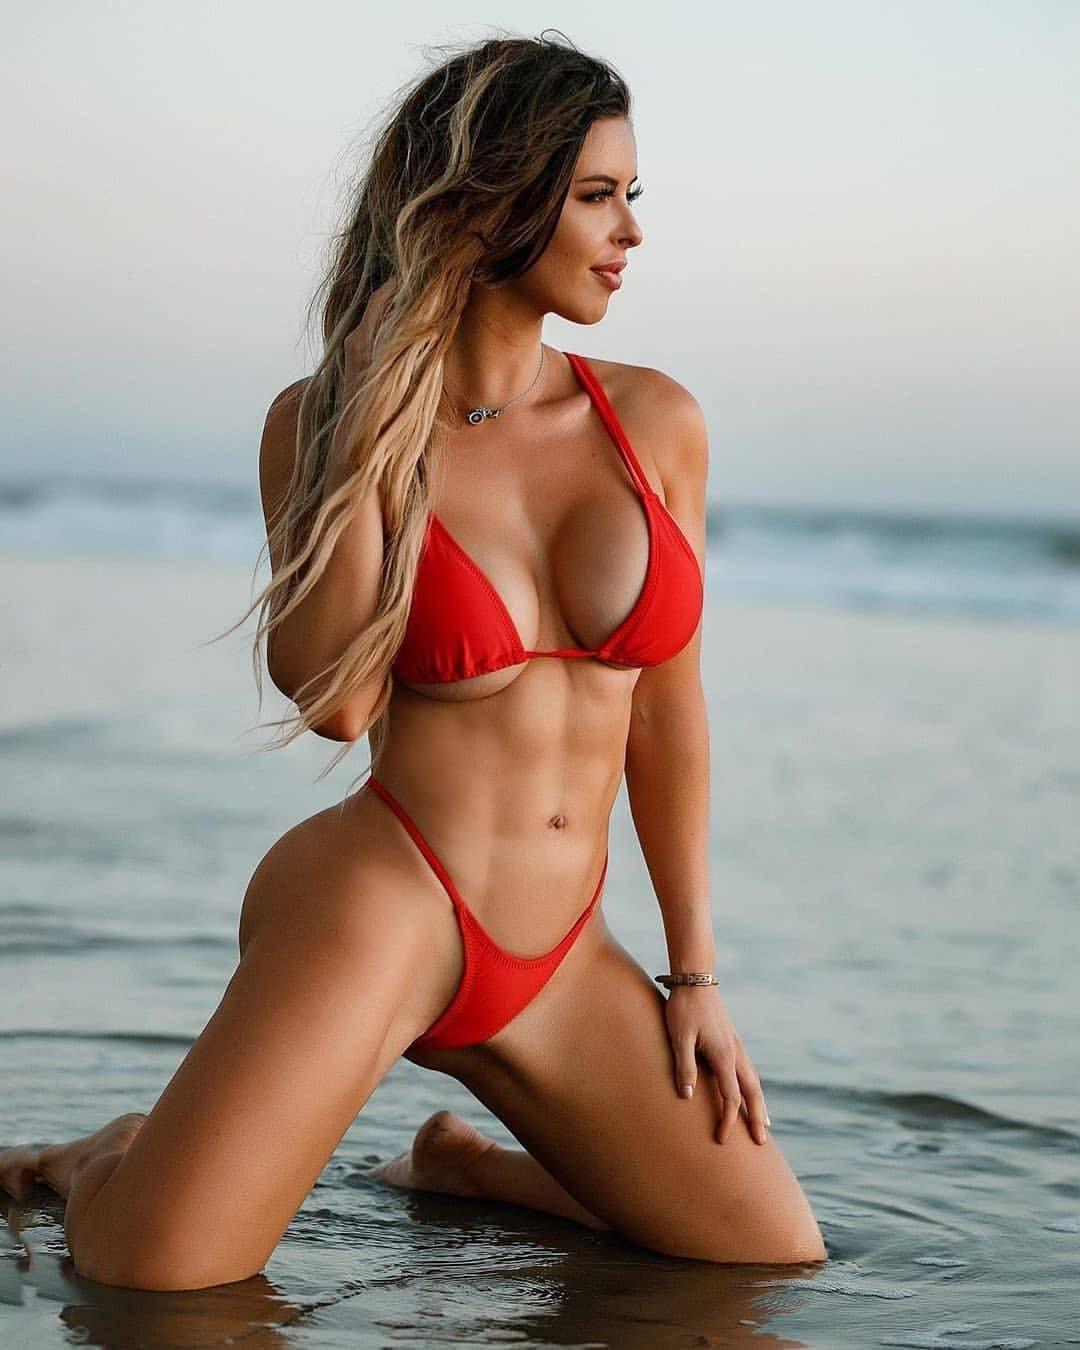 Nice Abs Stefi Fitness Chicas En Bikini Fotos De Chicas